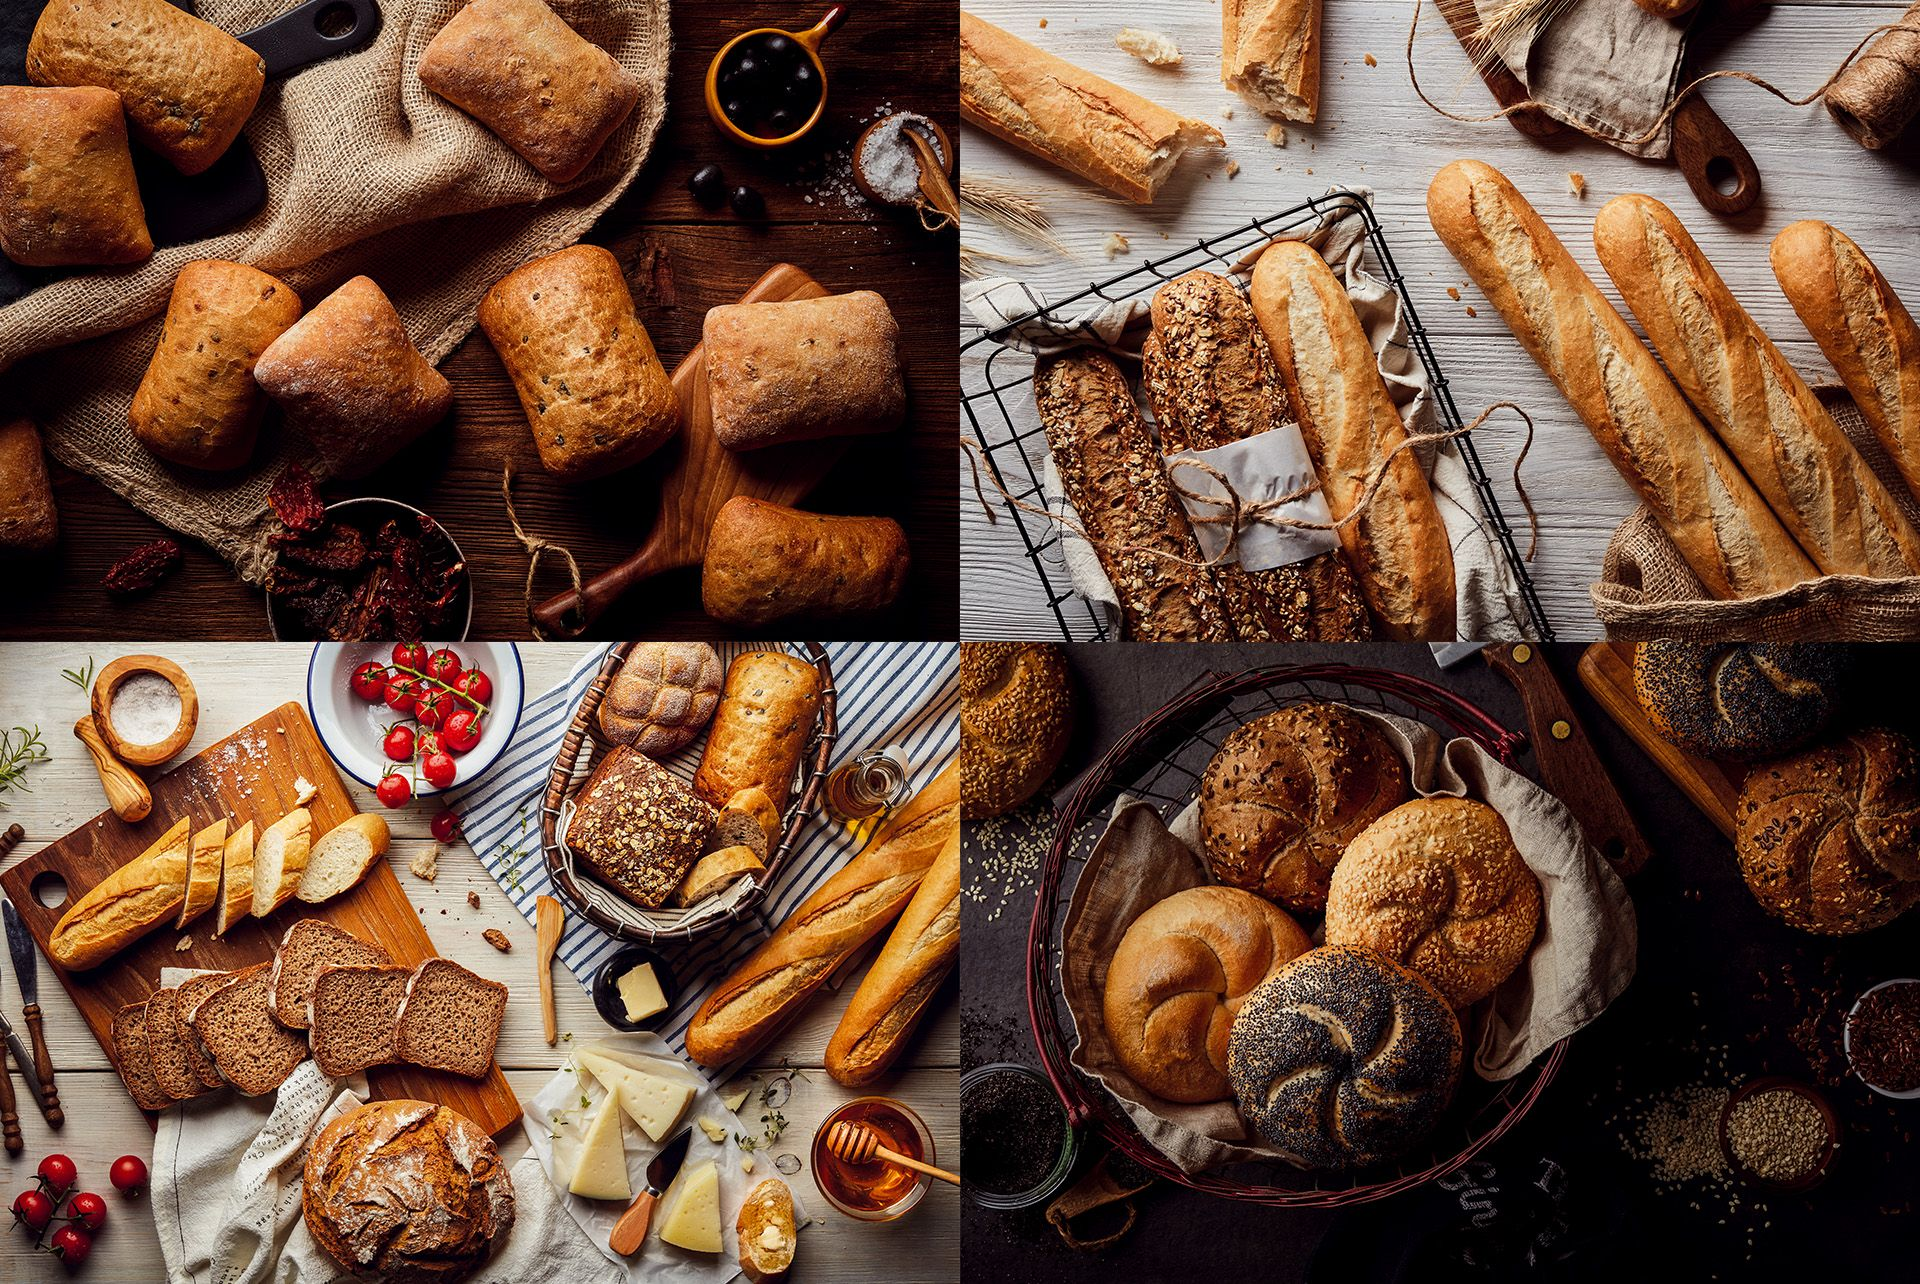 Sesja Produktowa Piekarnia Nowel